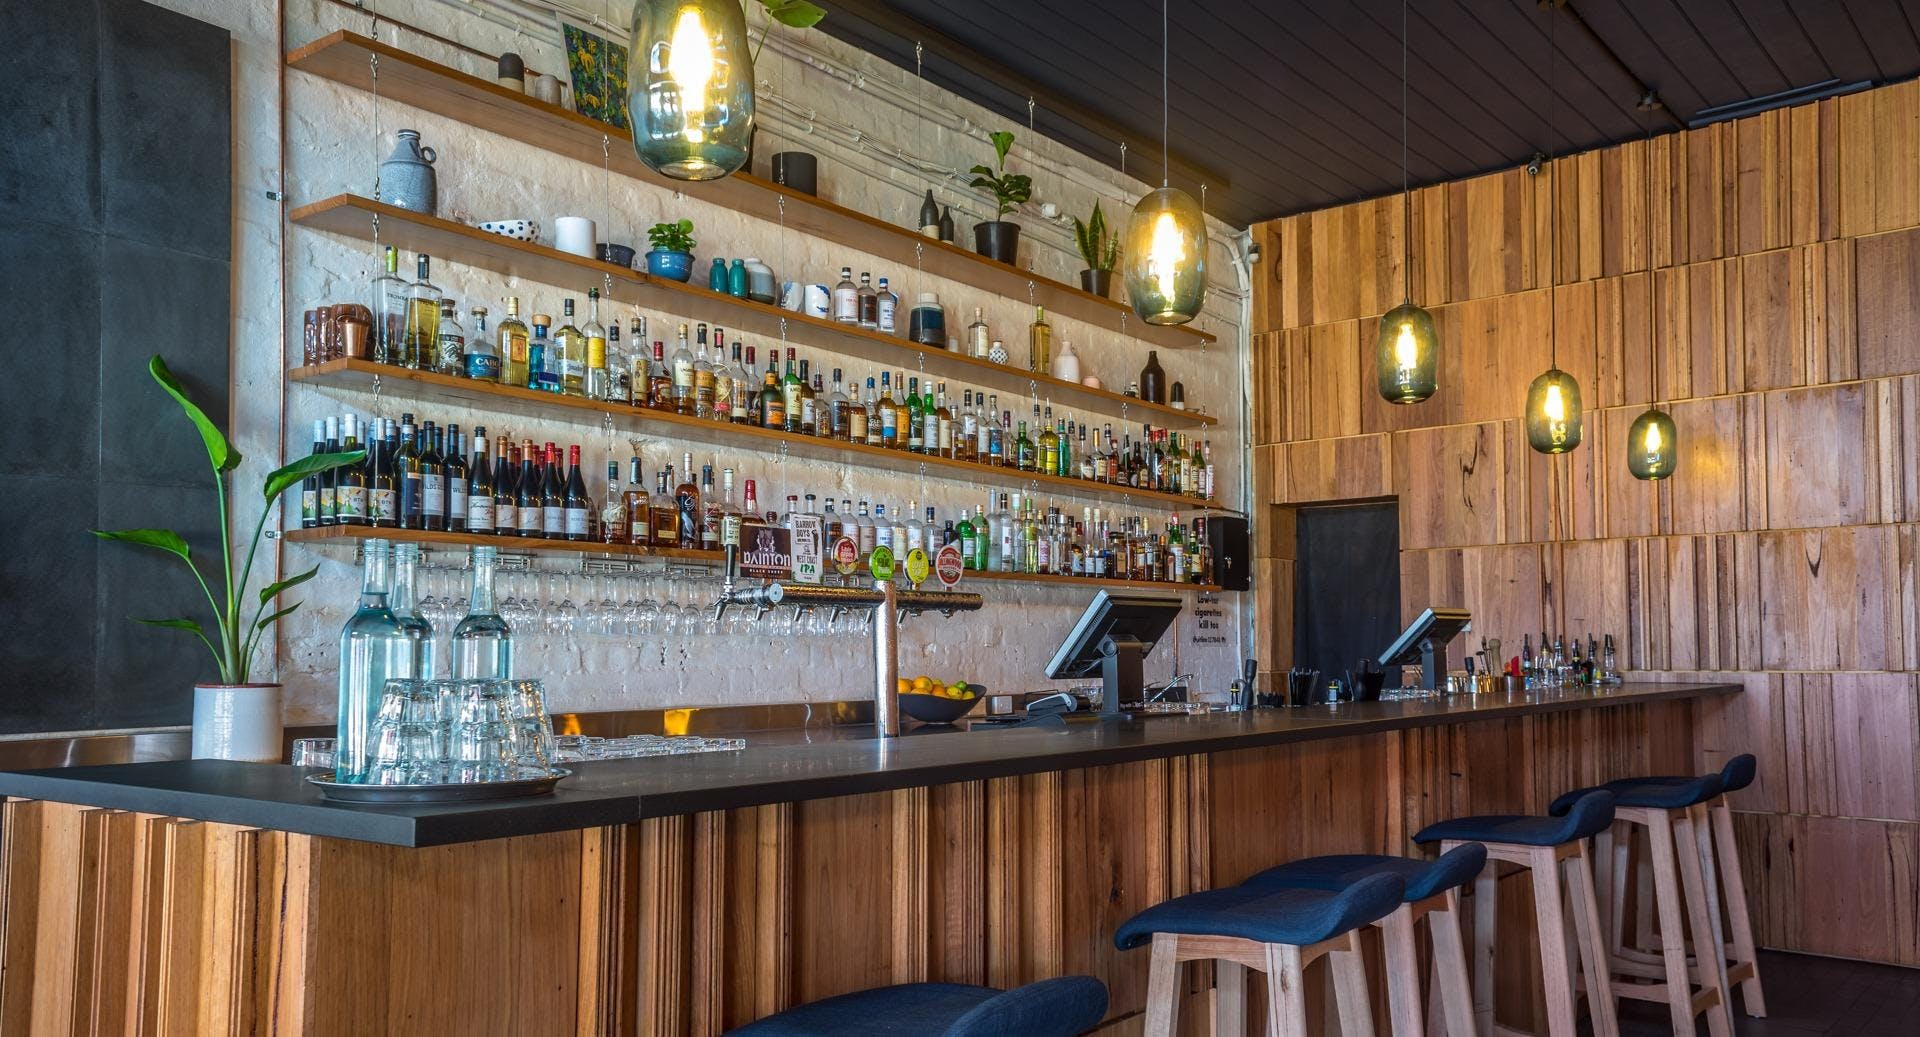 BOWERBIRD Tapas and Gin Bar